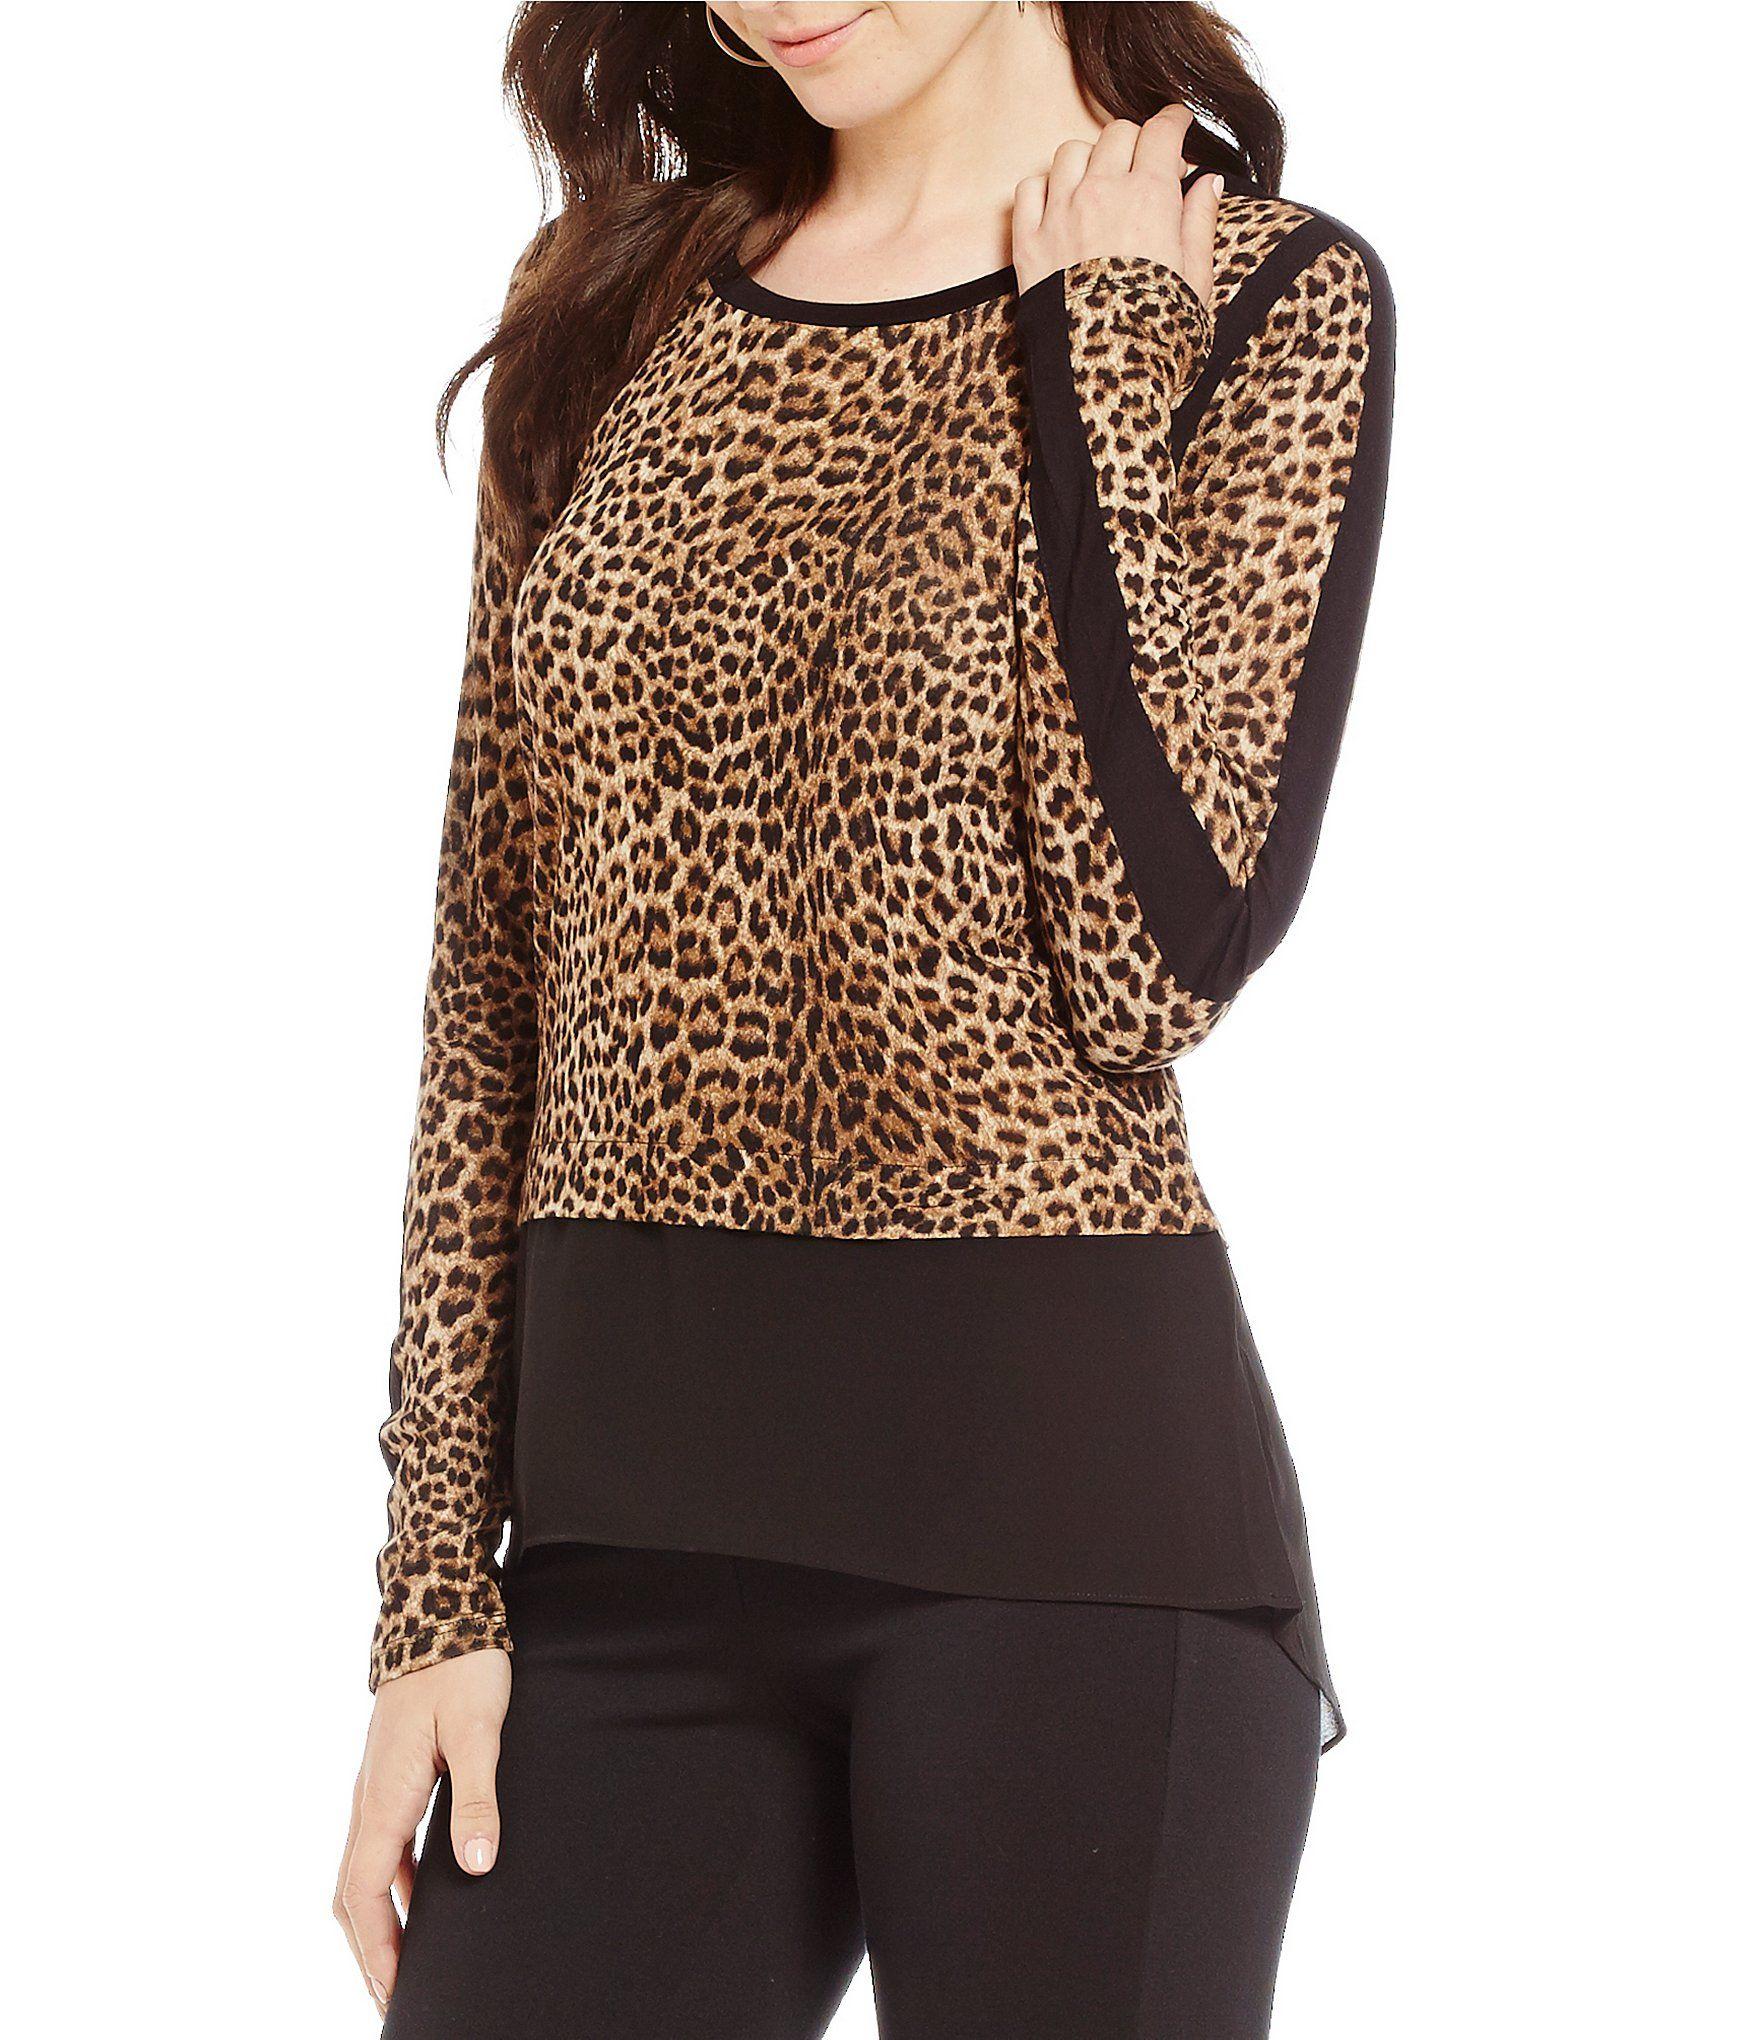 d927795a56 Shop for MICHAEL Michael Kors Persian Leopard Print Knit Jersey Hi-Low  Georgette Hem Tunic at Dillards.com. Visit Dillards.com to find clothing